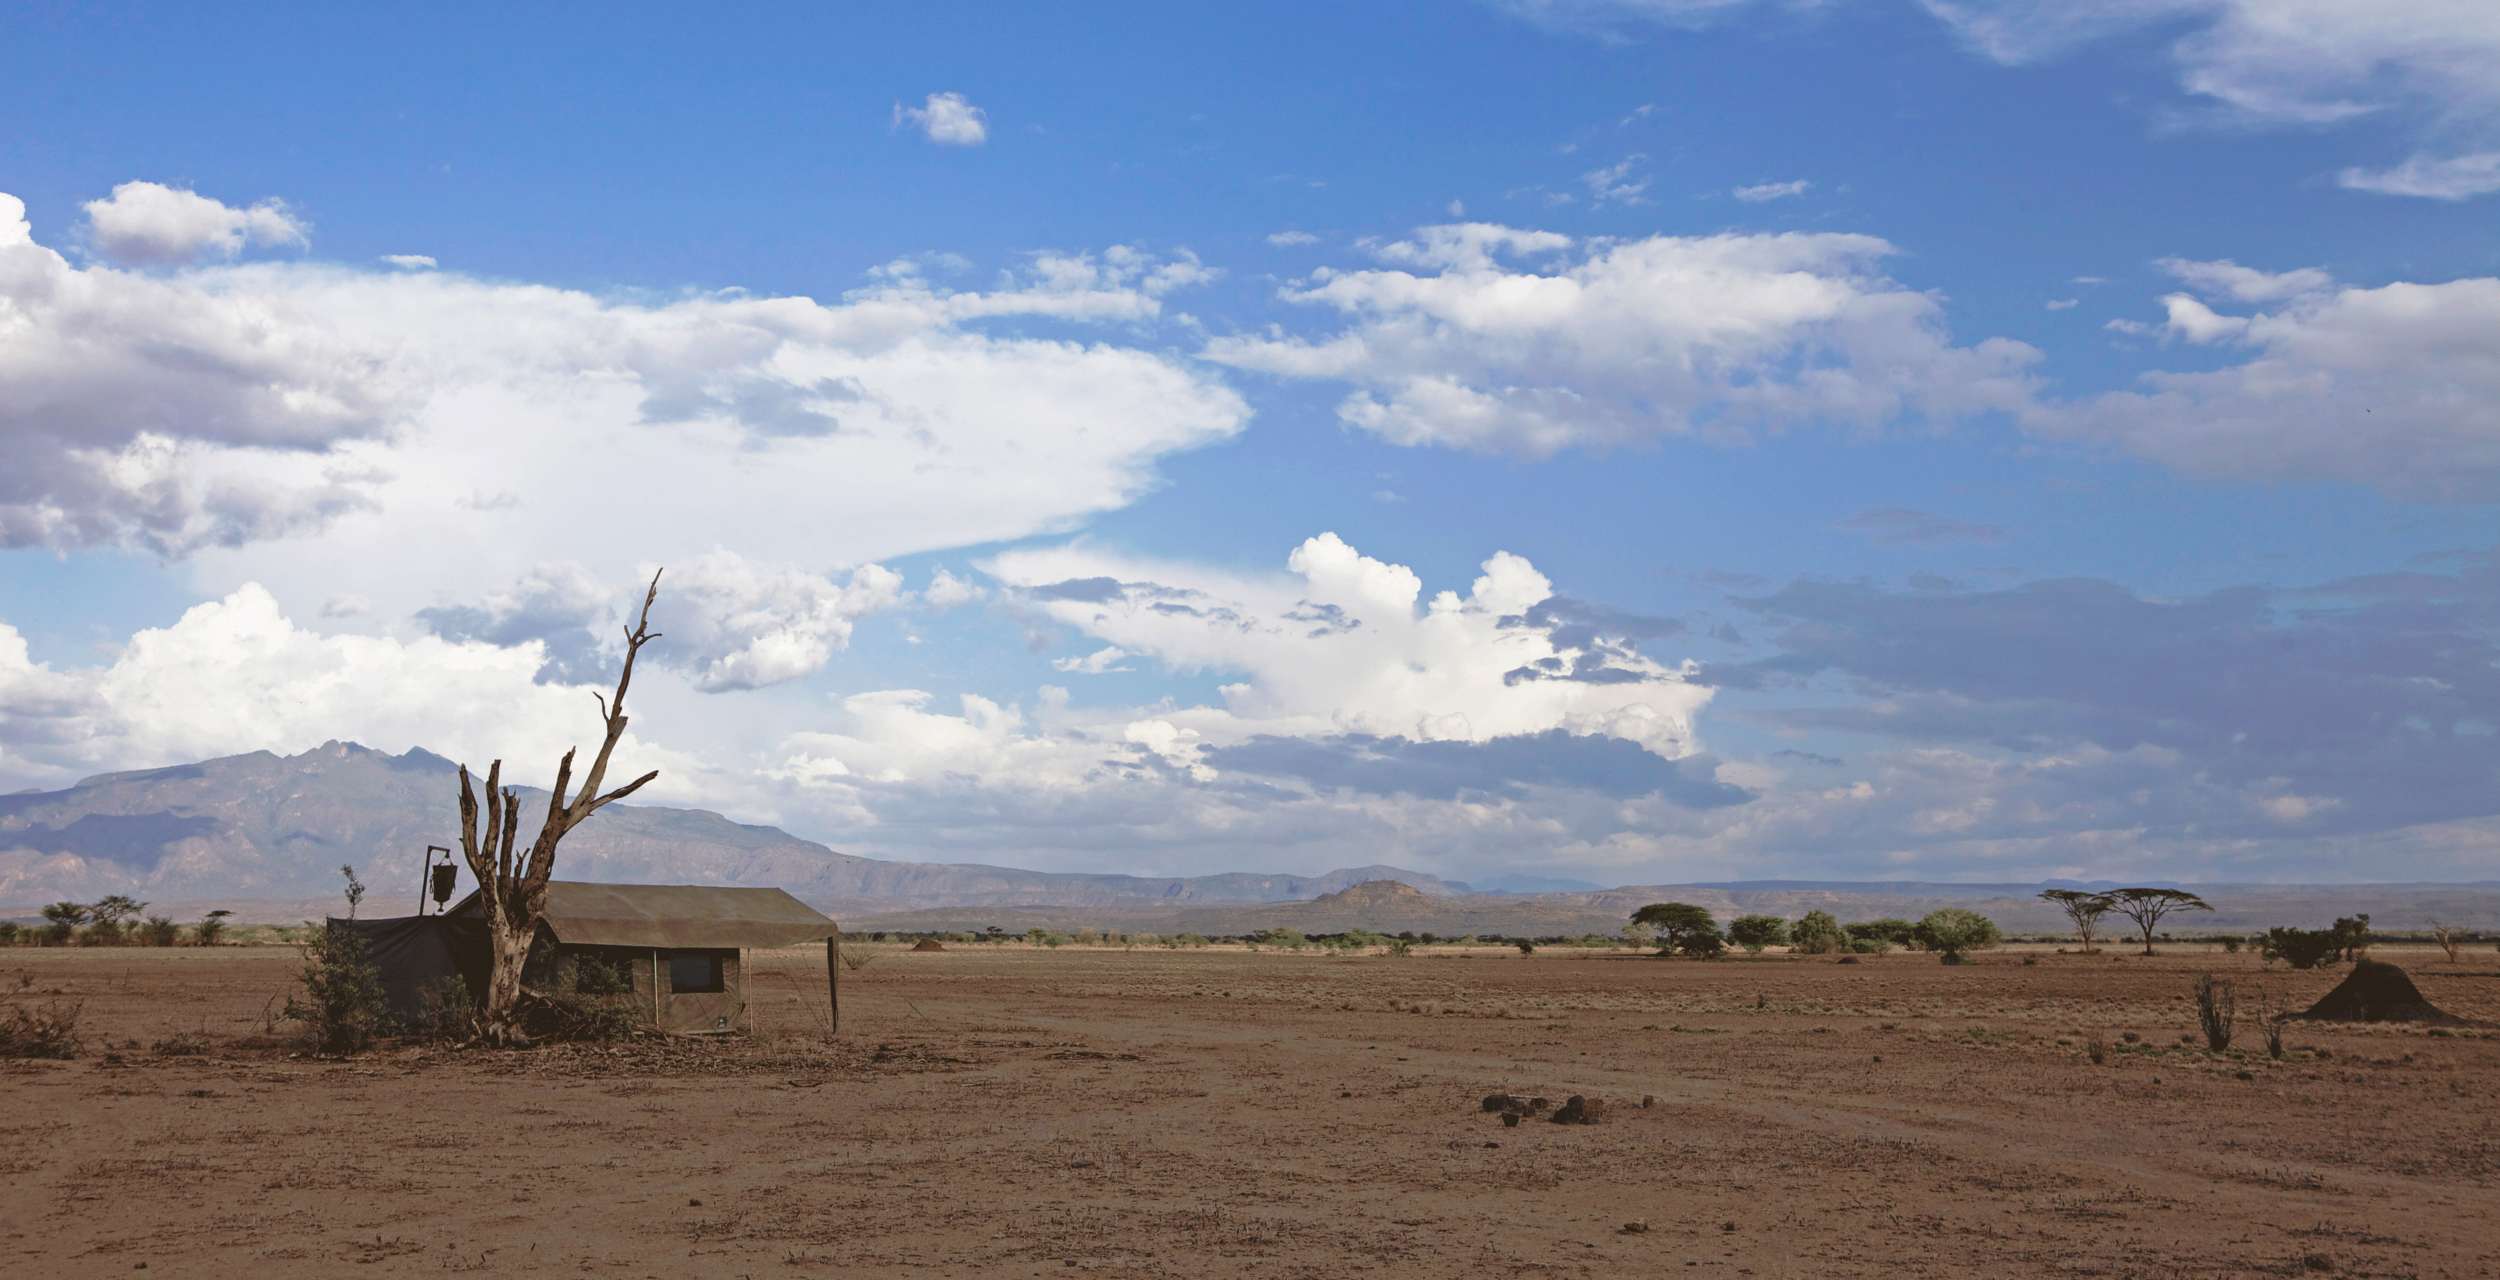 Tent-on-Plain-Alideghi-Ethiopia.png